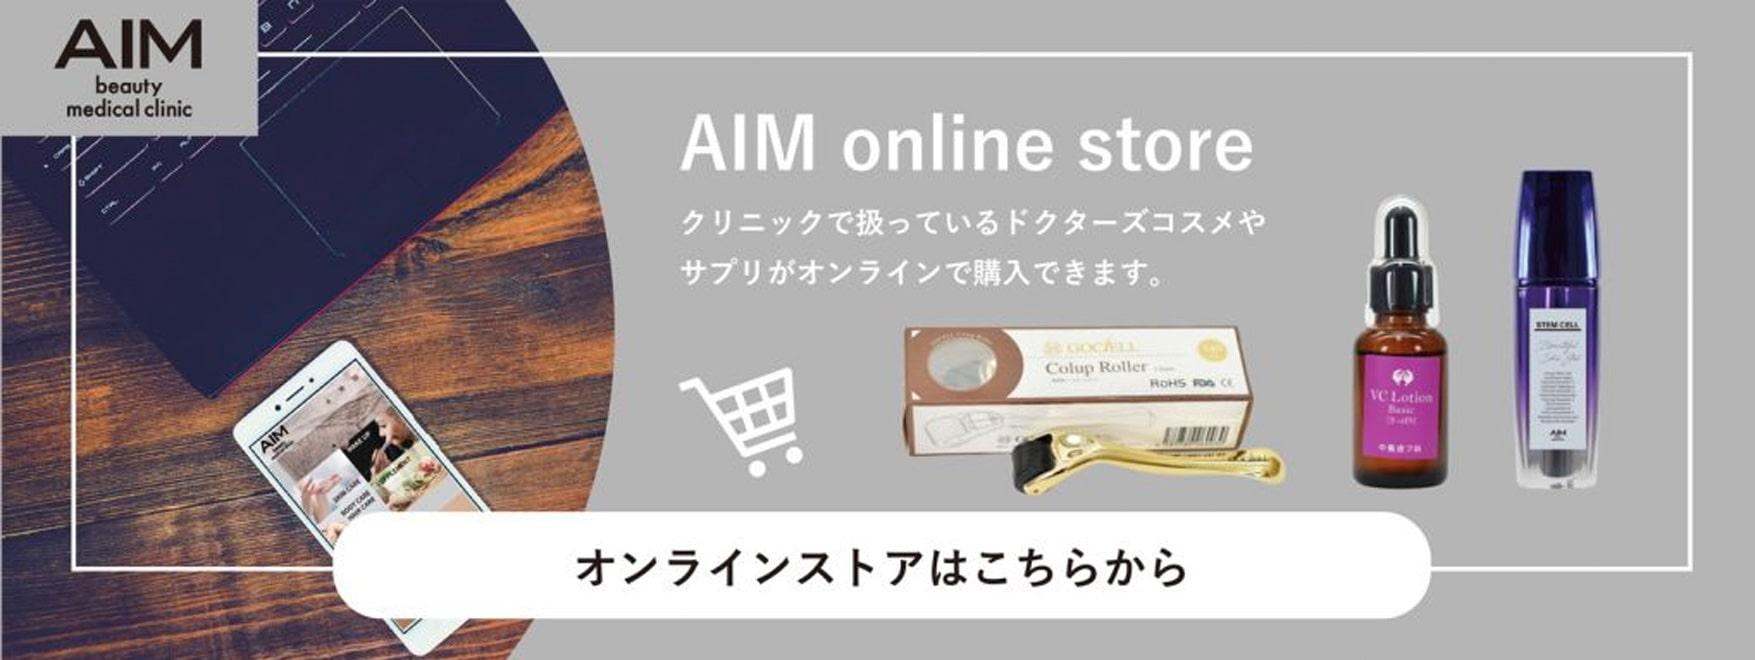 AIM online store